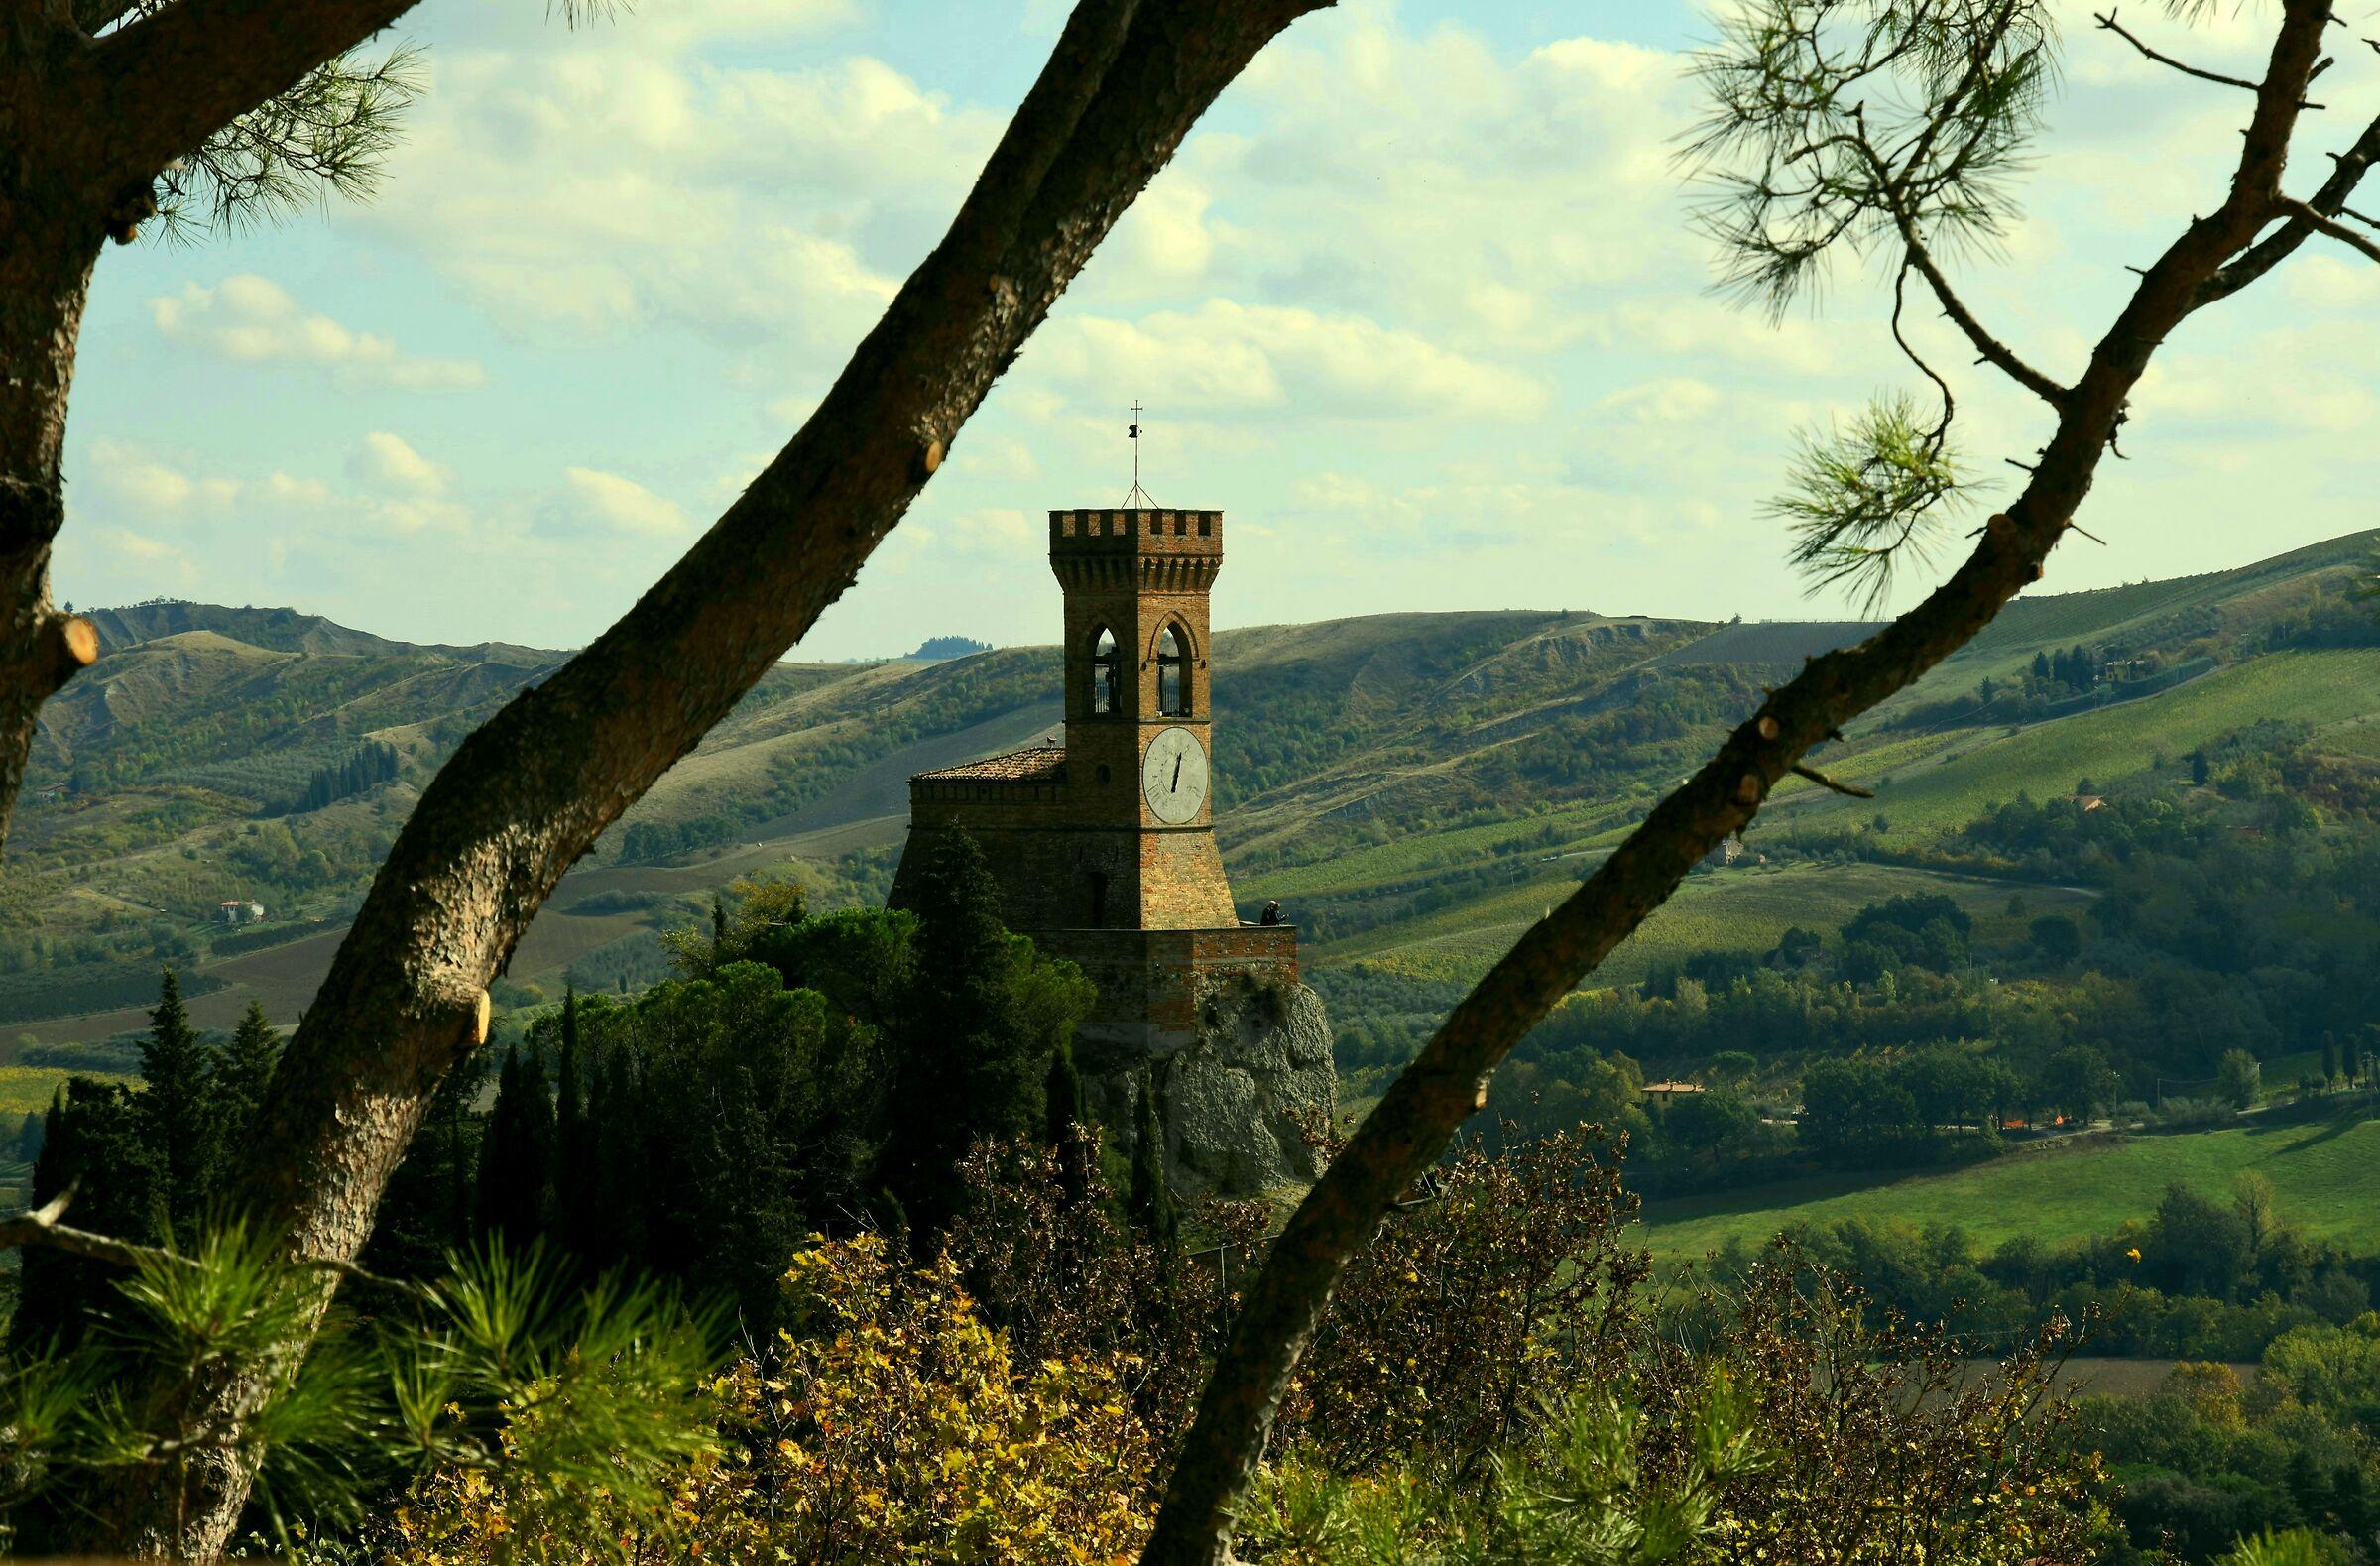 Briseghella clock tower...